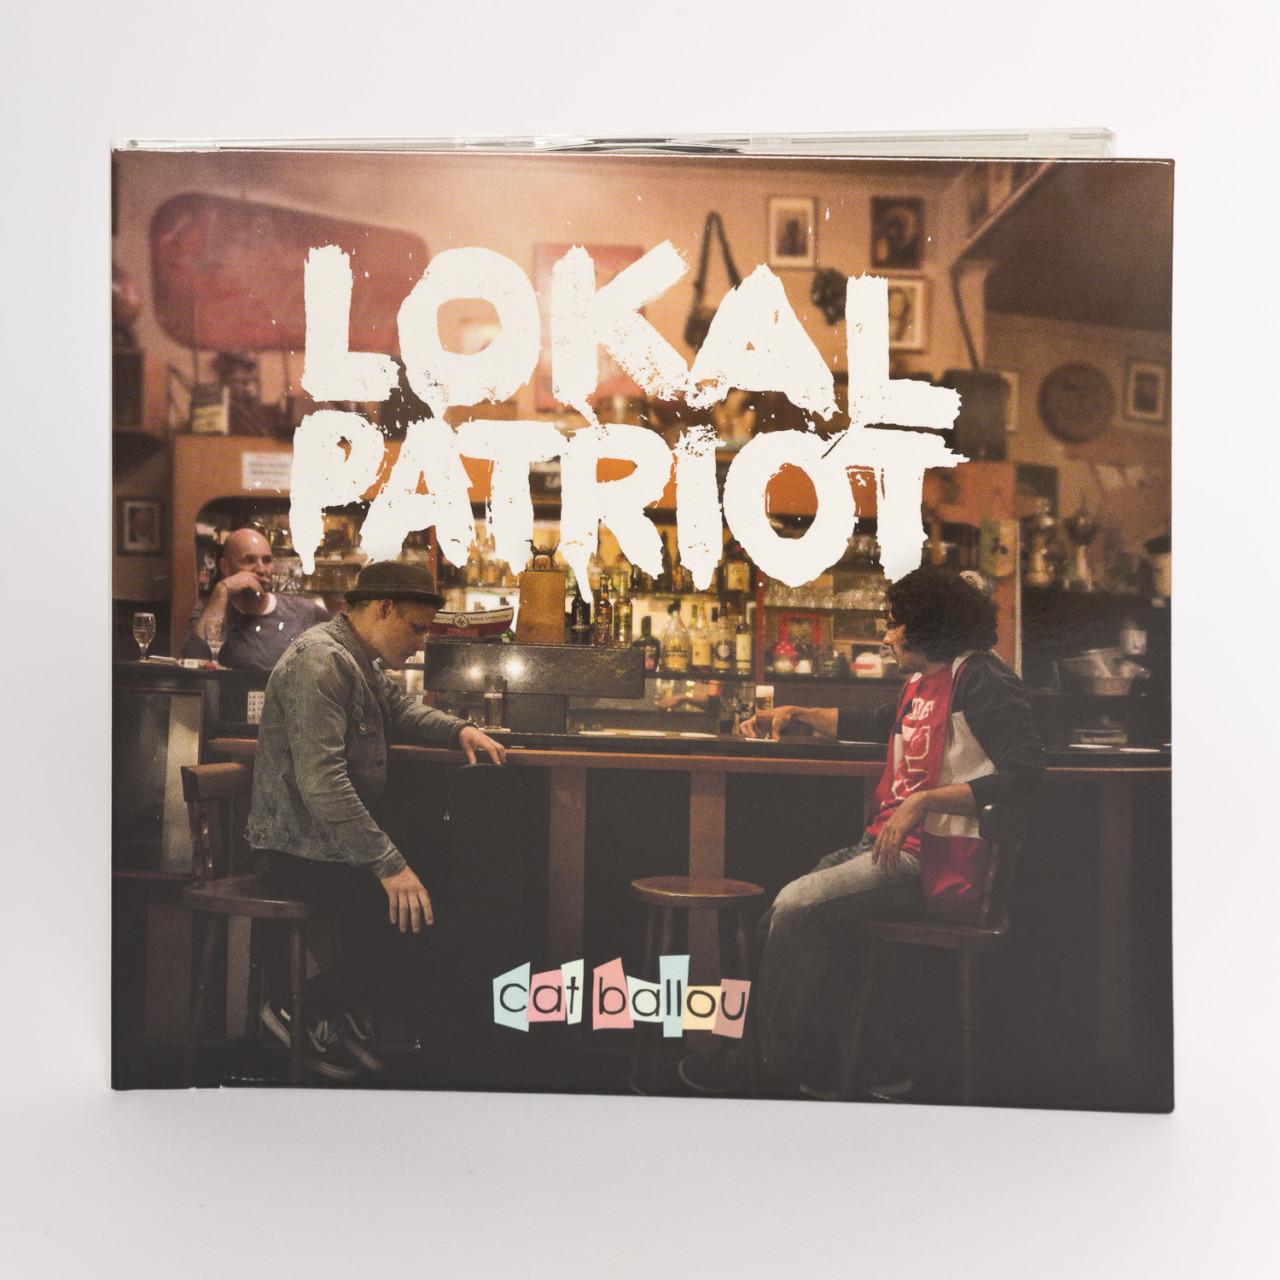 Hi, I am Jonas Lokal Patriot